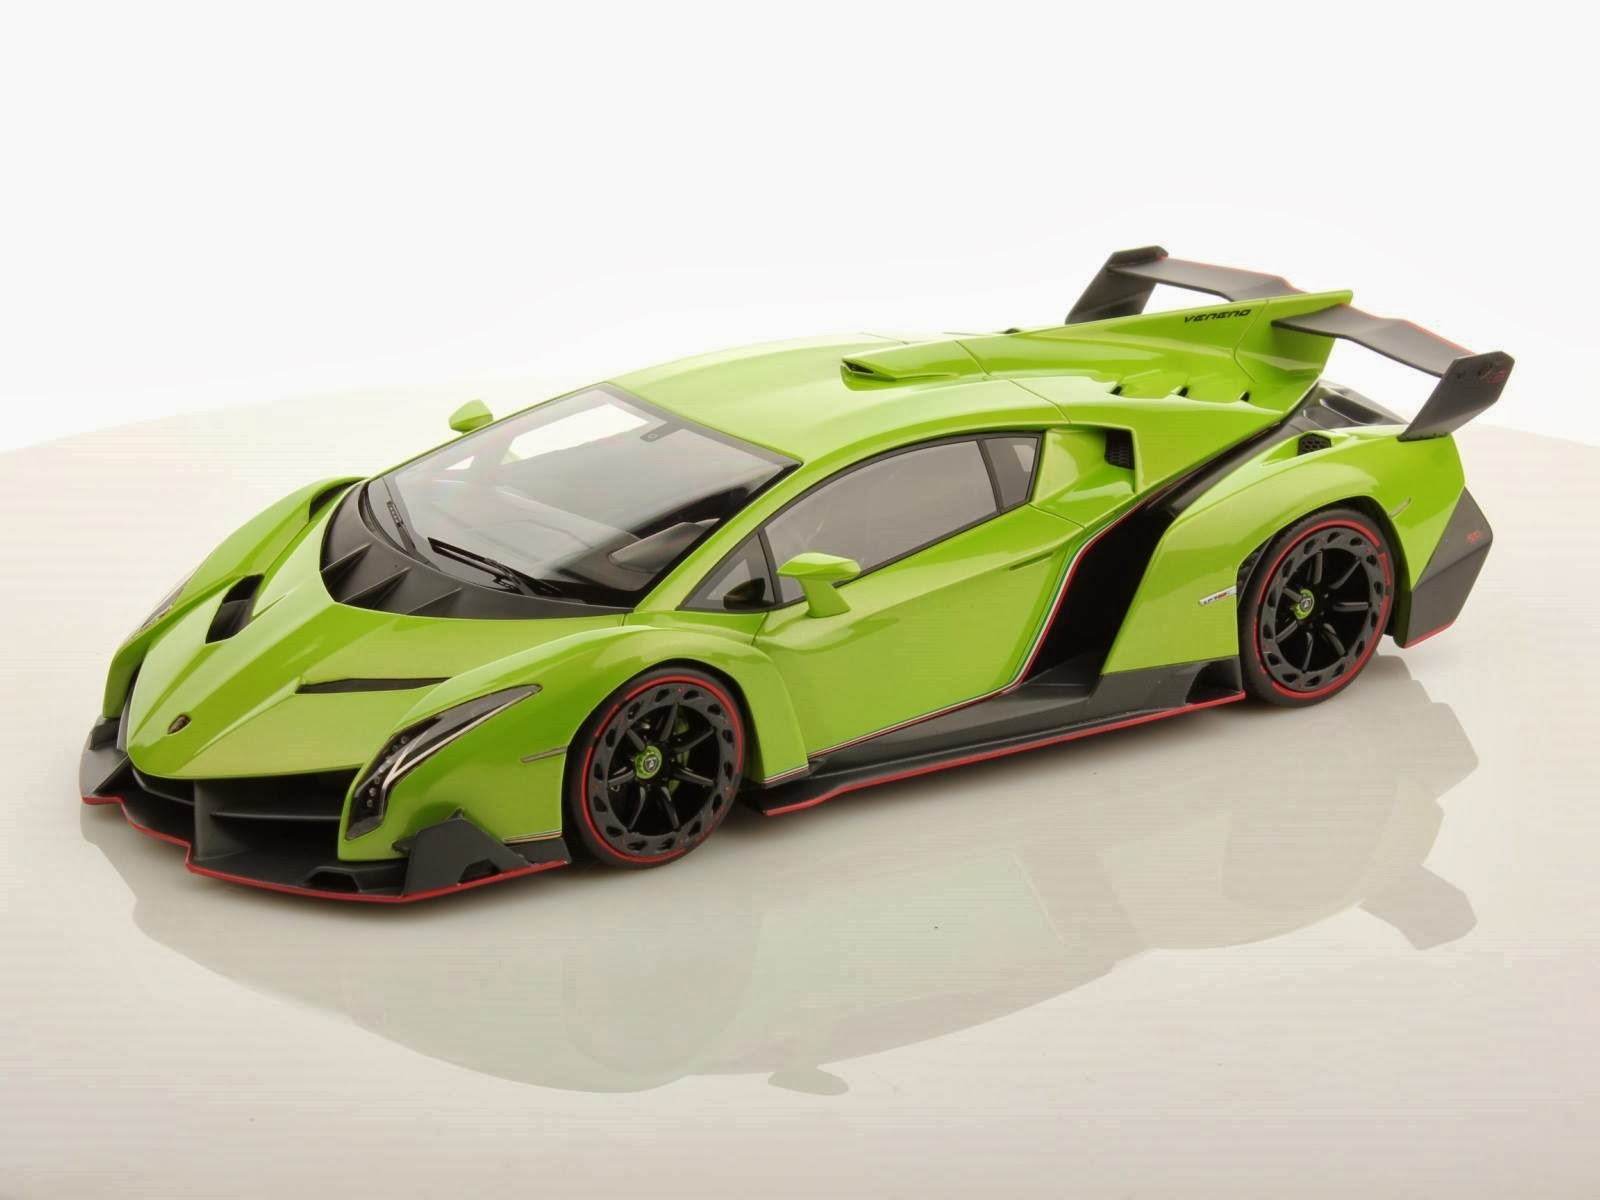 Foto Mobil Lamborghini Veneno Green Front Side View